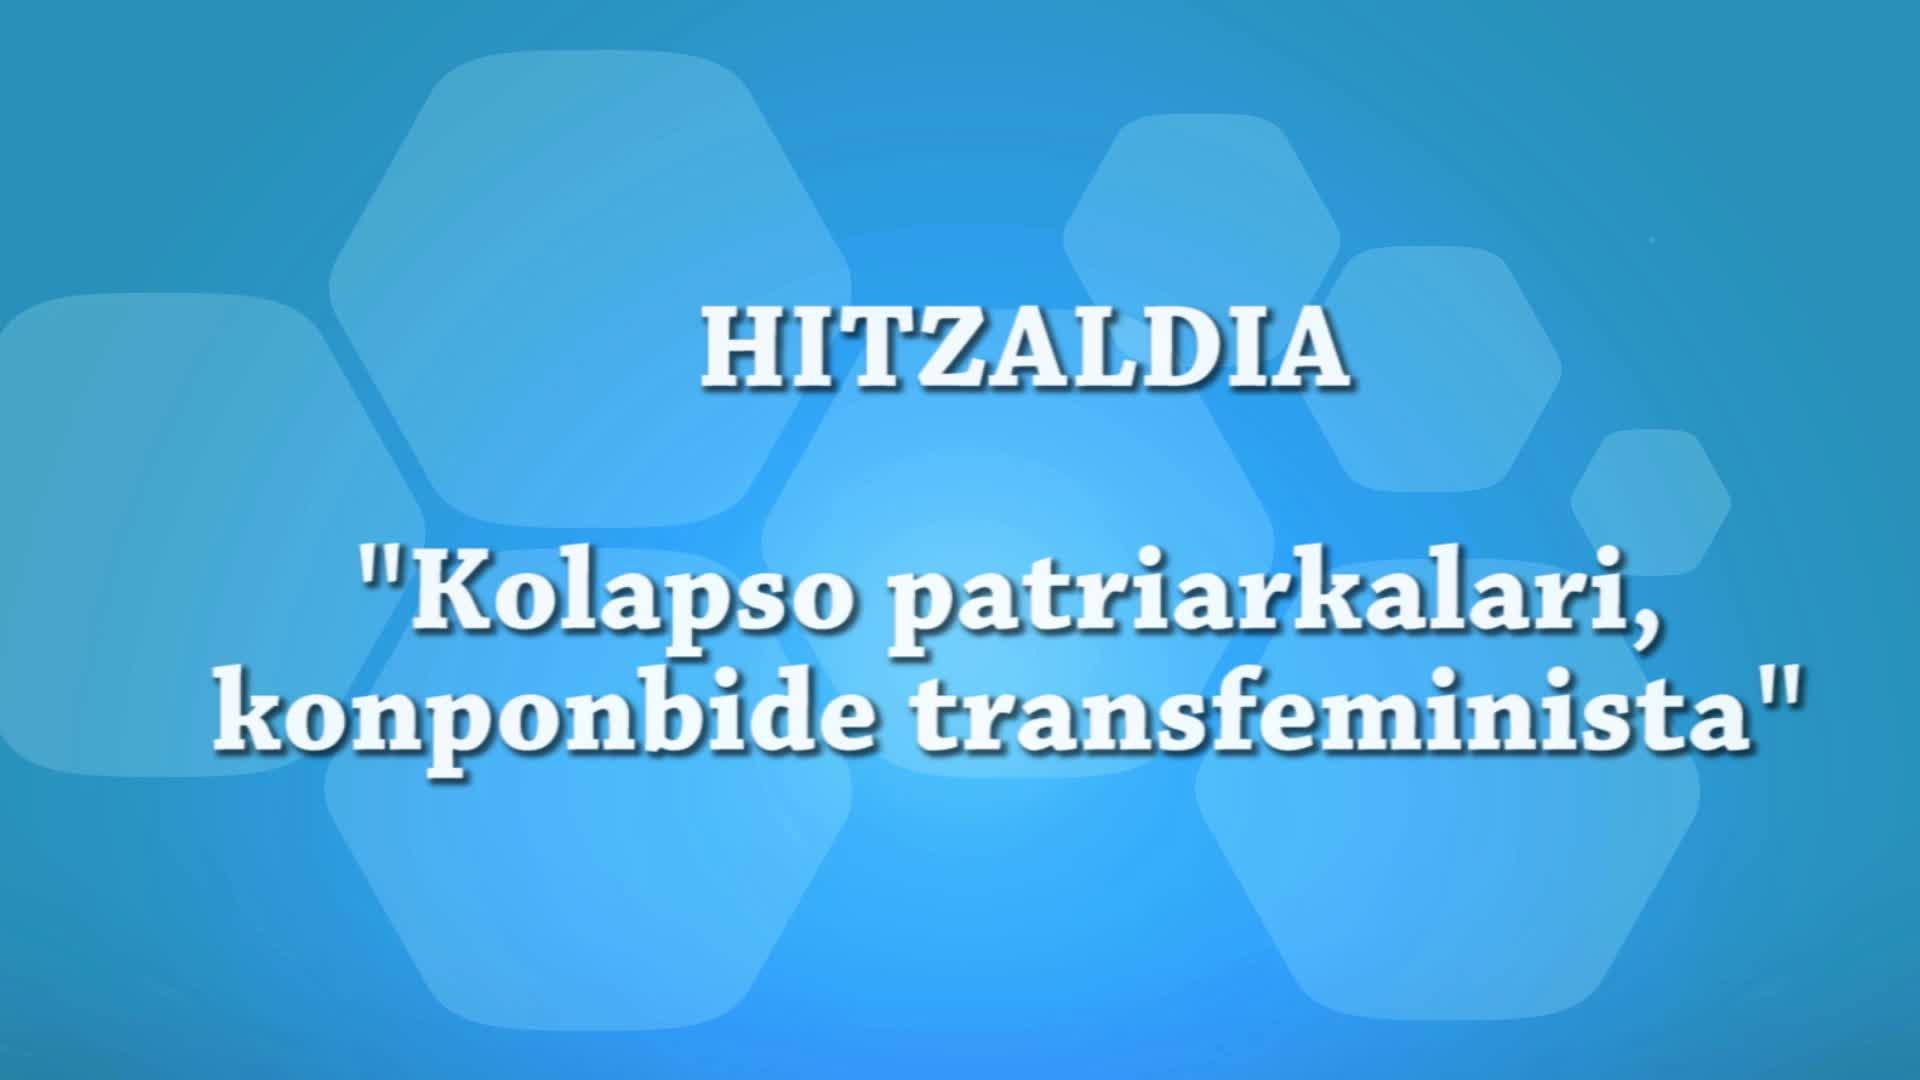 """Kolapso patriarkalari, konponbide transfeminista"" hitzaldia, Josebe Iturriozen eskutik"